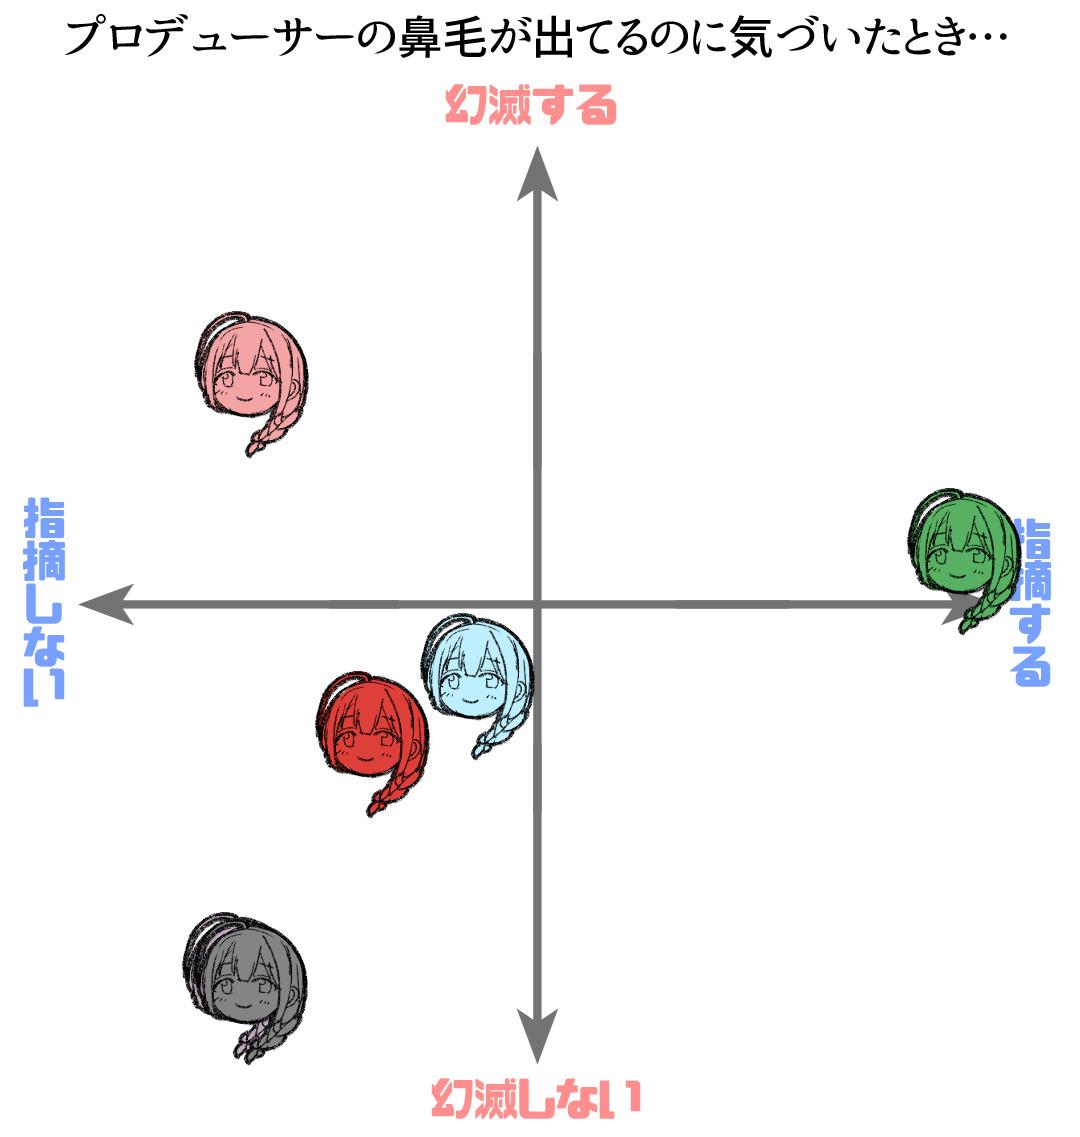 f:id:hoshi_sano:20200414113634j:image:w400